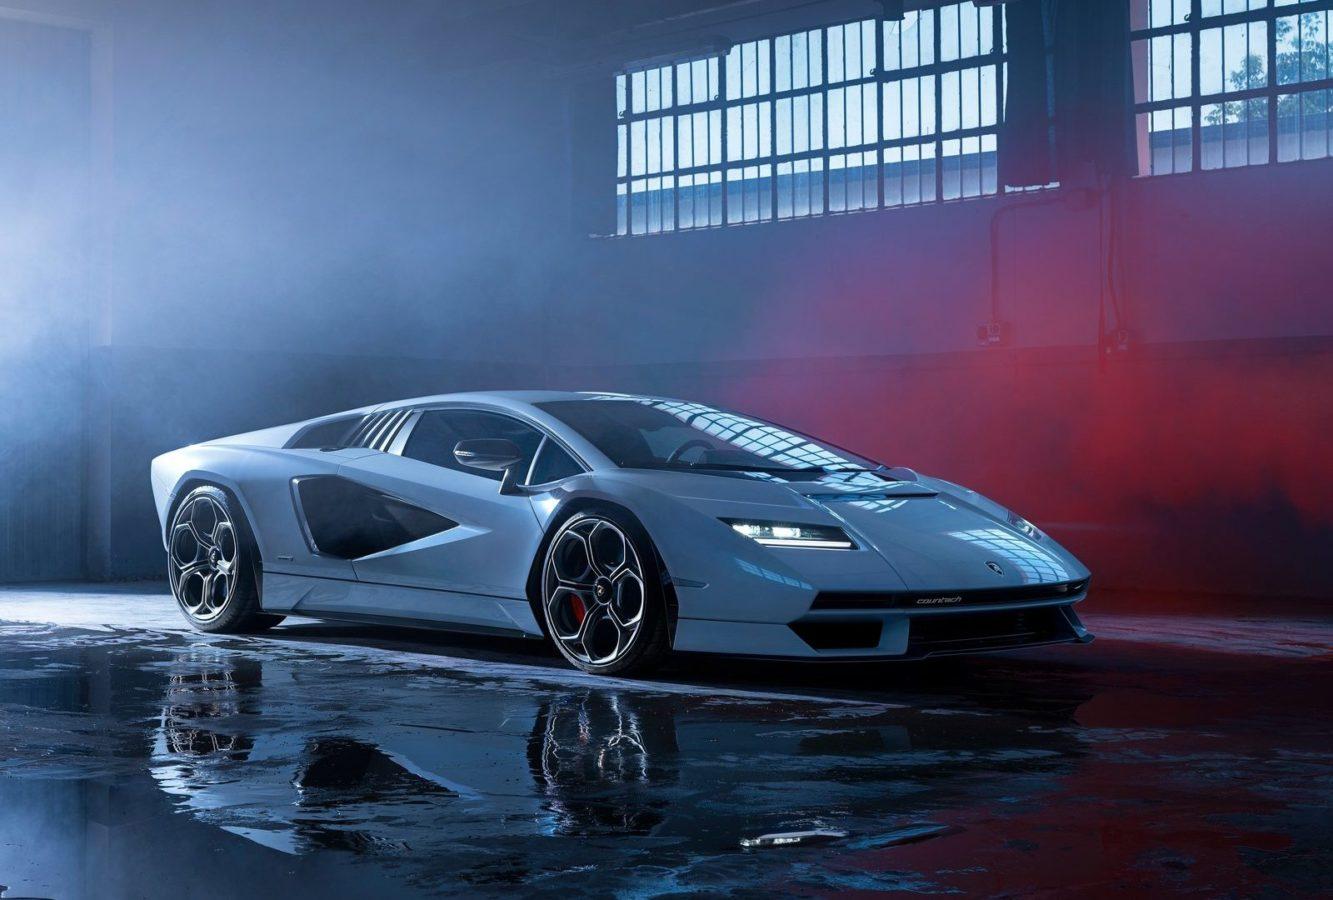 Lamborghini revives the legendary Countach as a $2.6 million nostalgia bomb